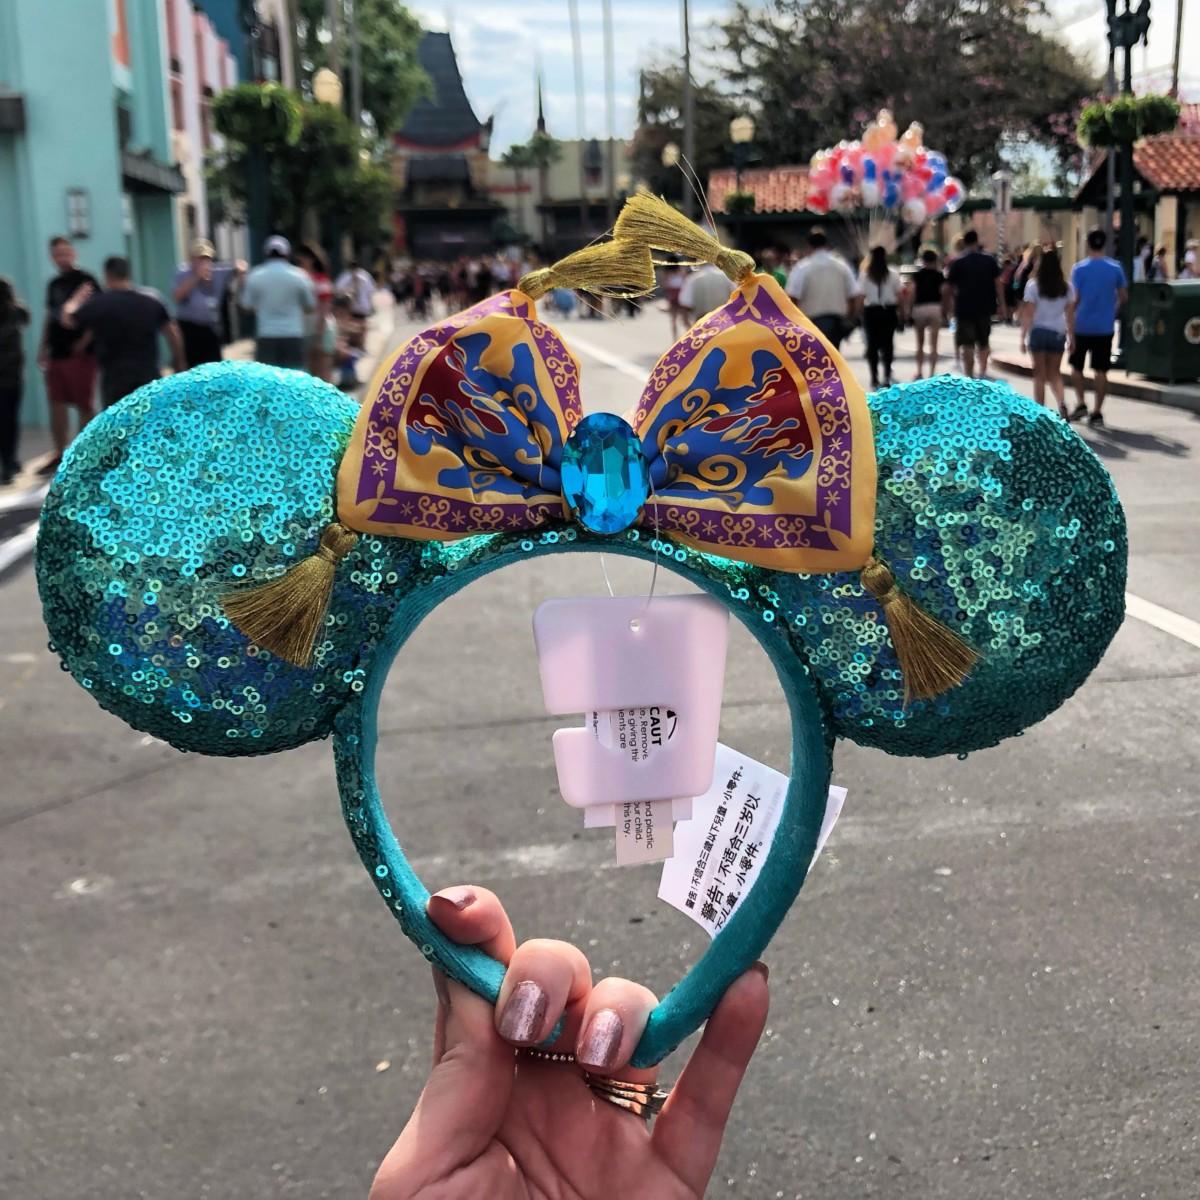 Three NEW Mouse Ear Headbands hit WDW! #DisneyStyle 3